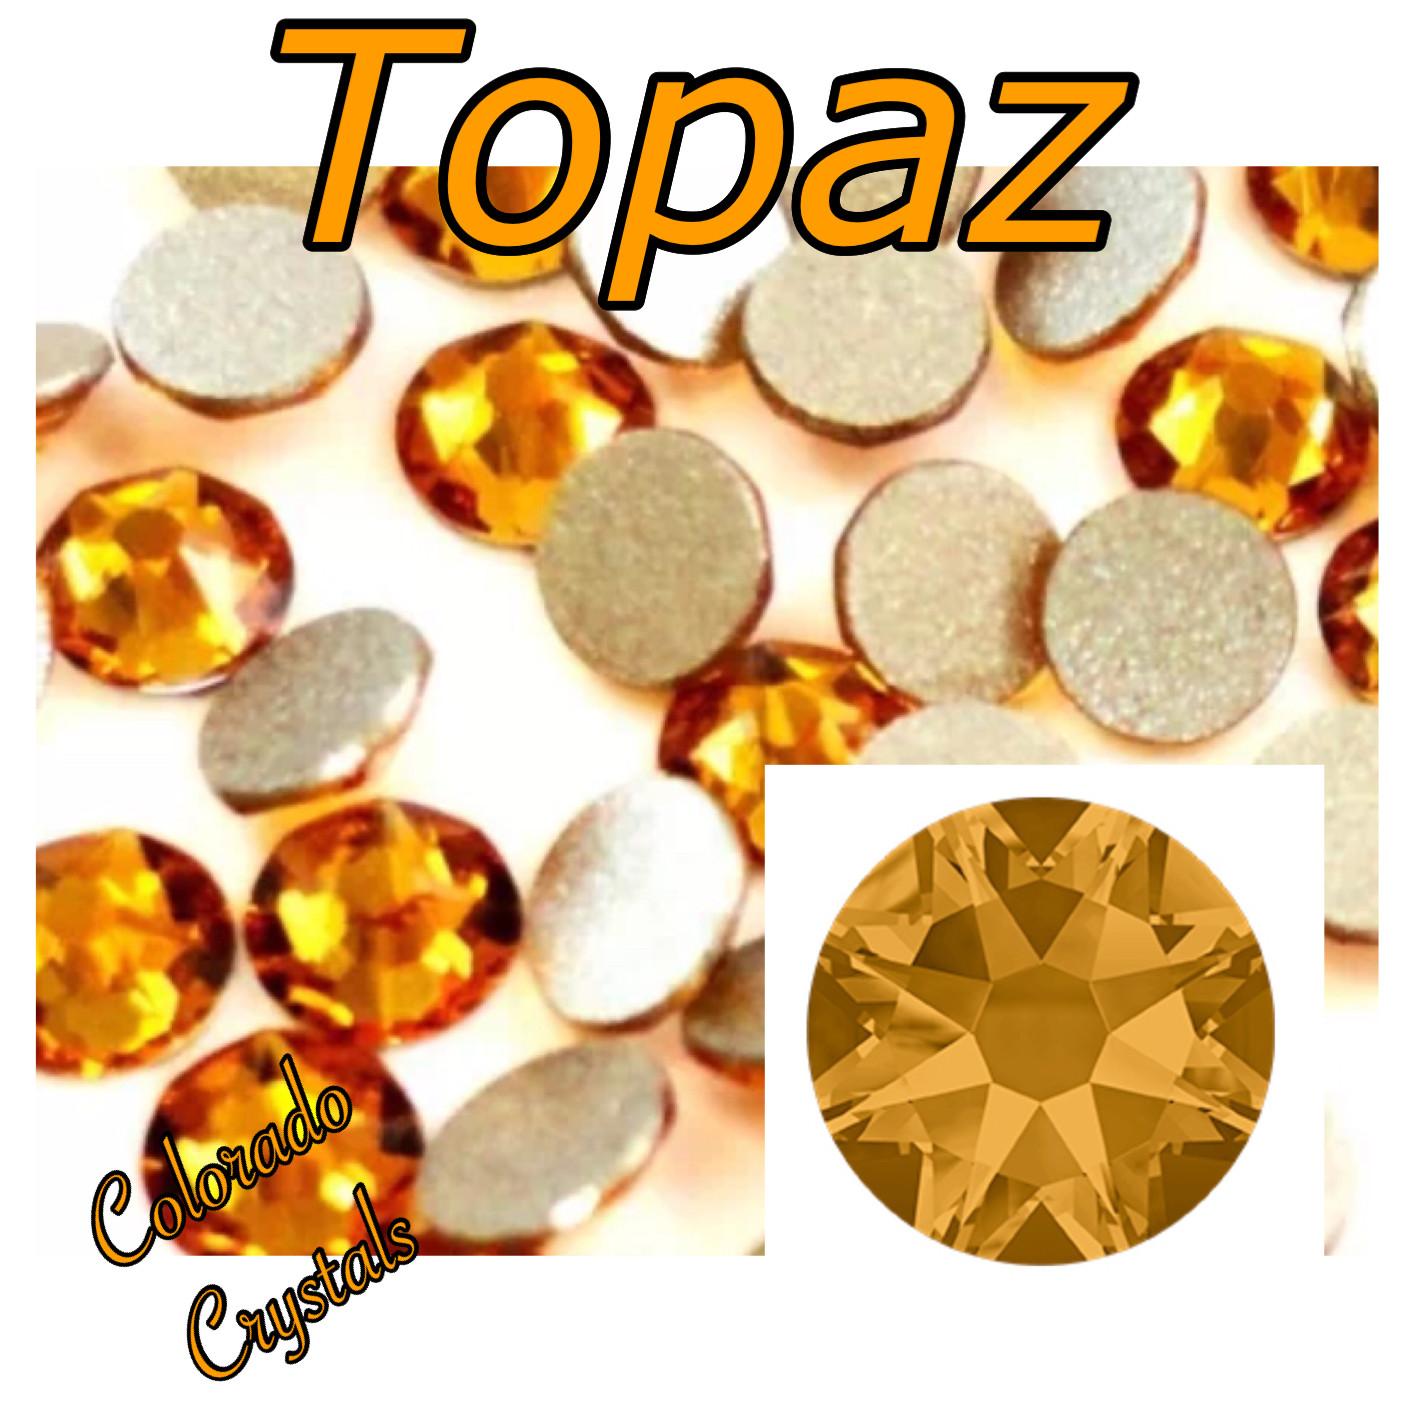 Topaz 20ss 2058 Discount Price on Swarovski Rhinestones